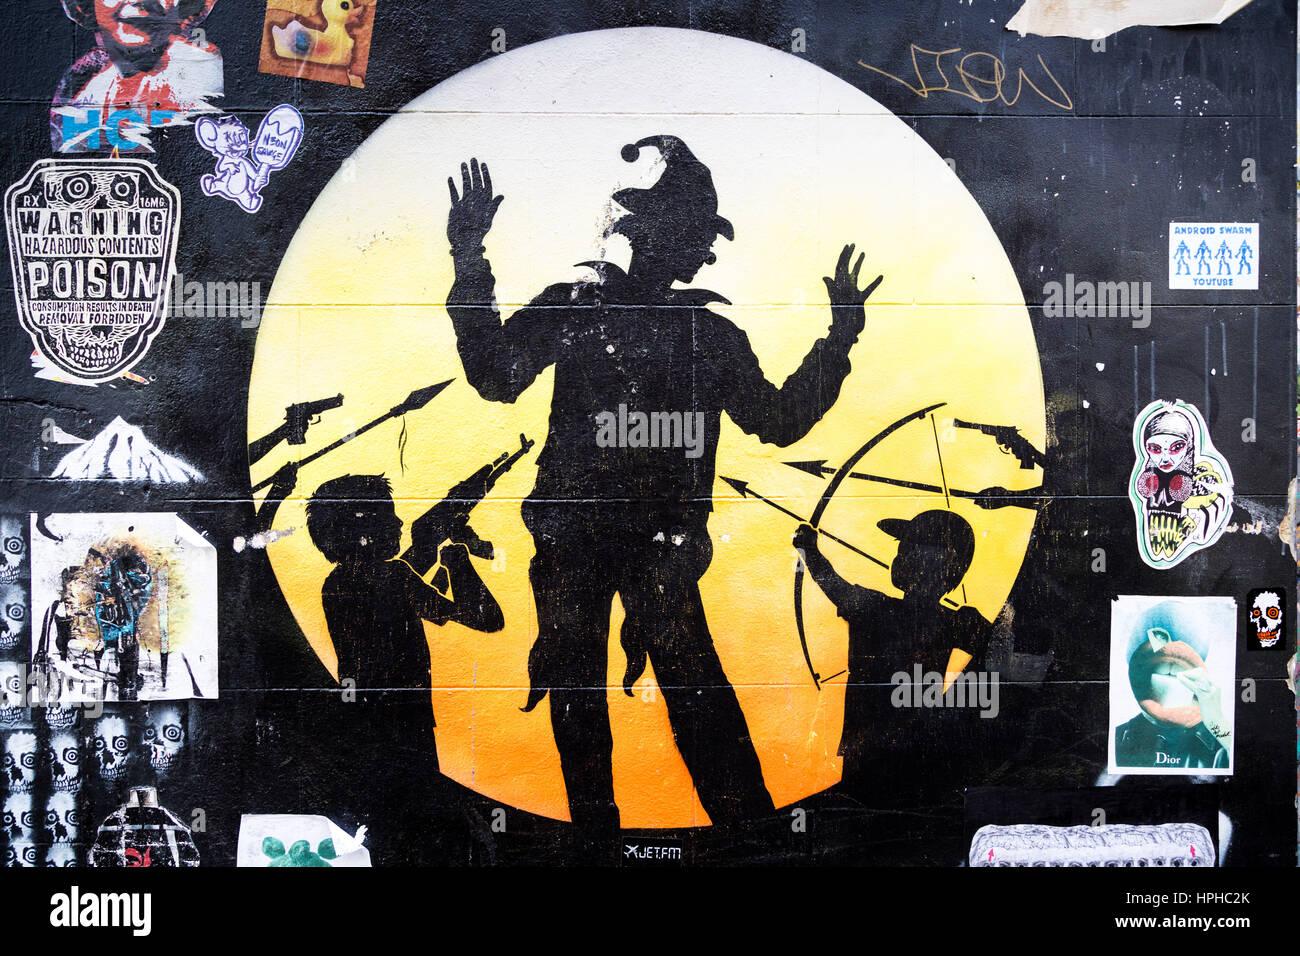 Shoreditch And Brick Lane Creative Graffiti And Social Art In East